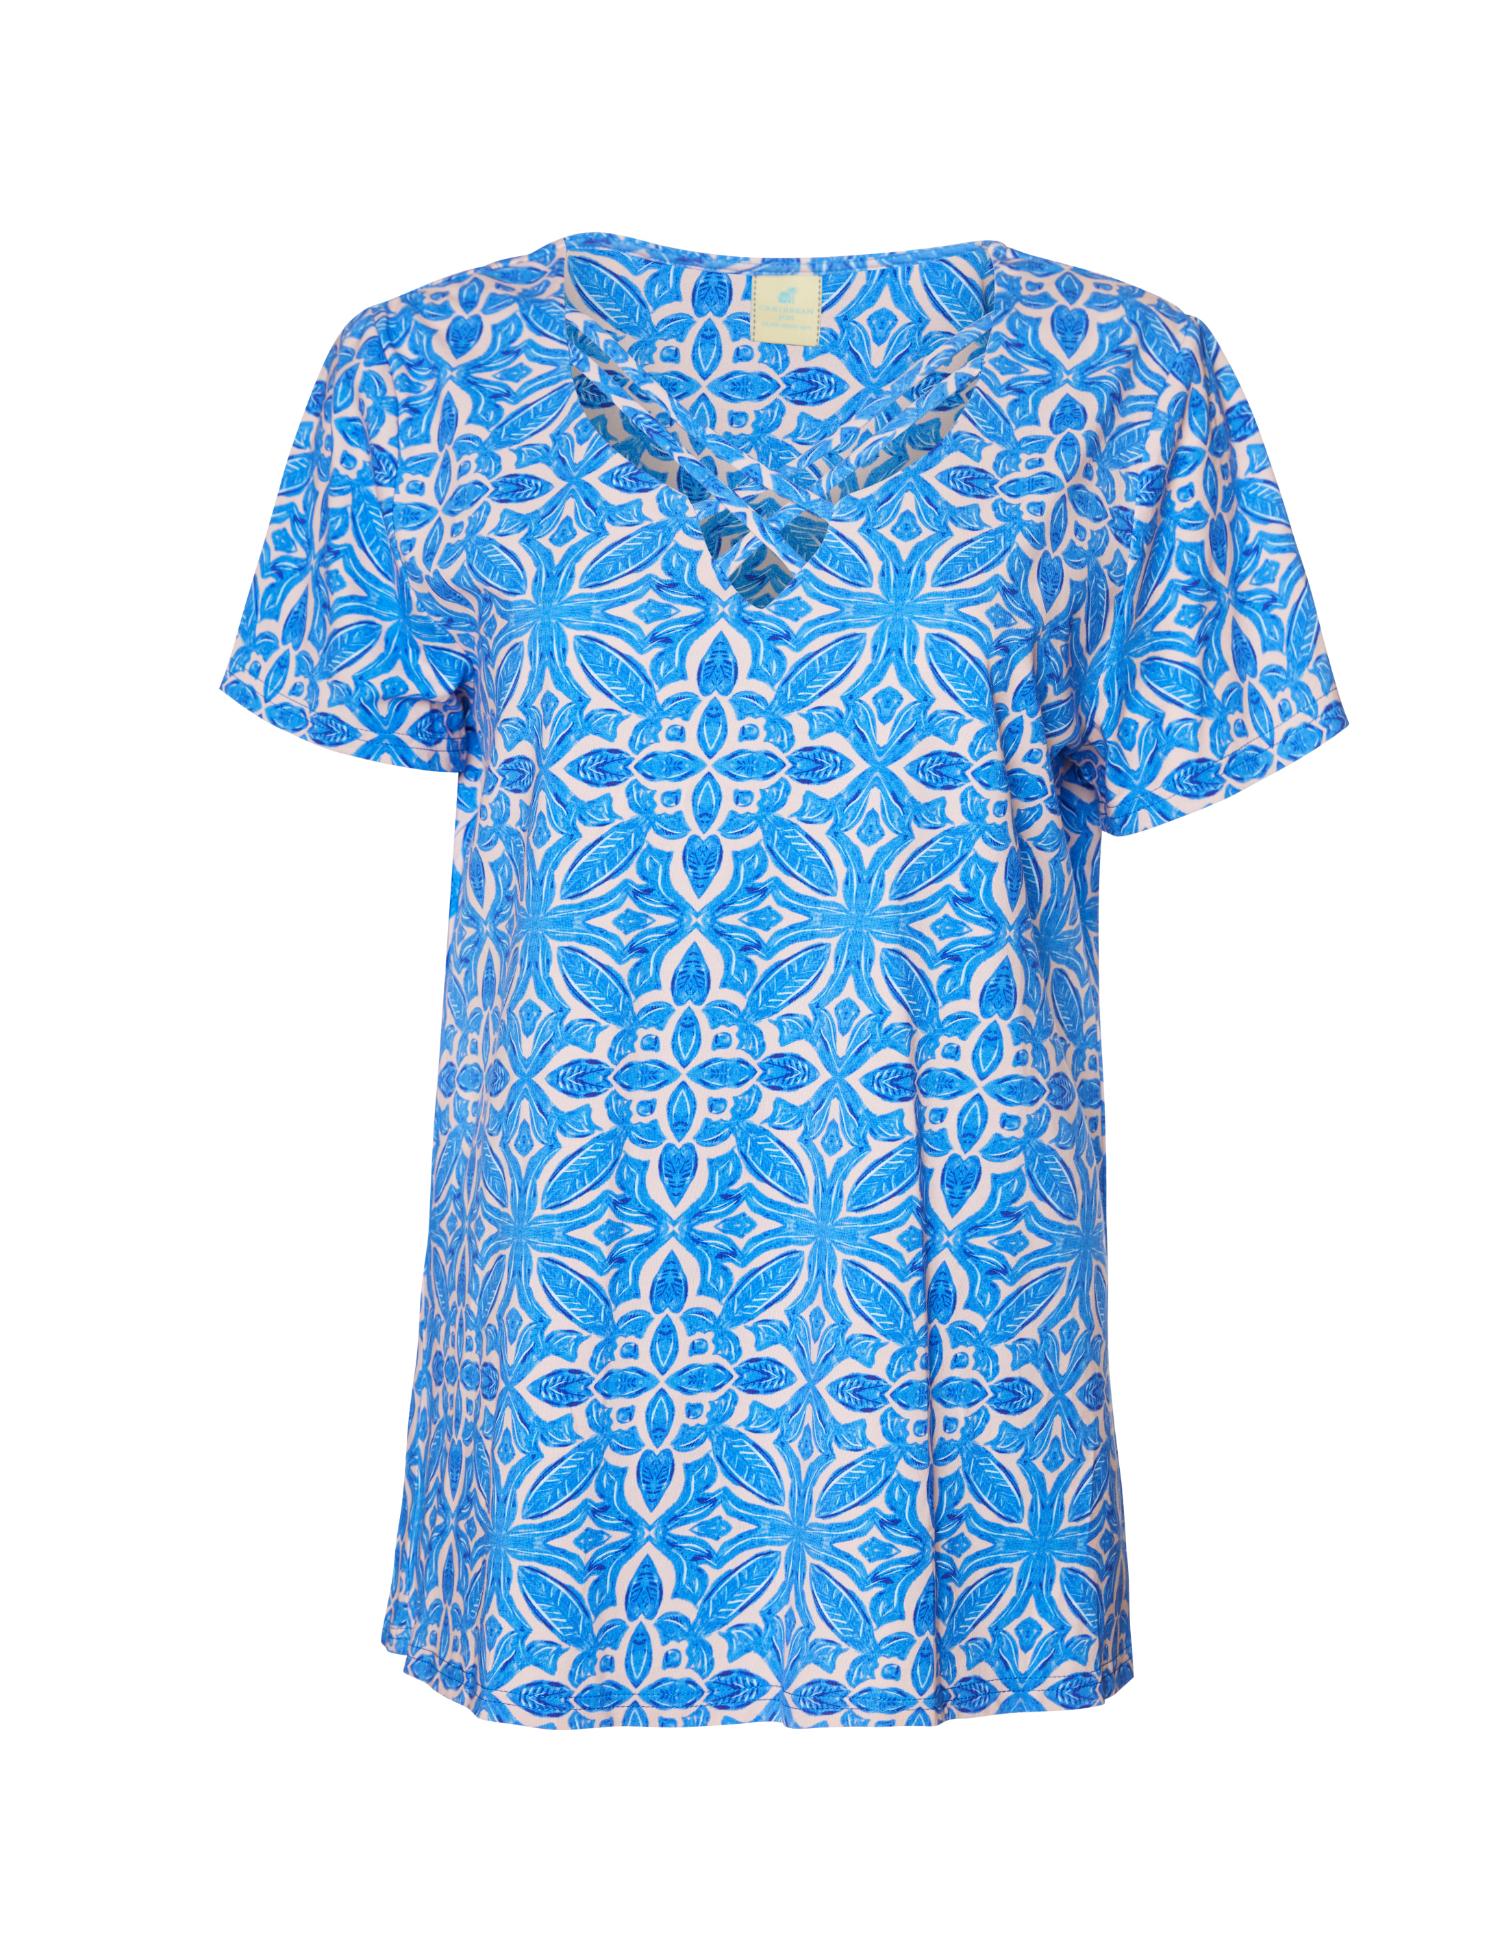 Caribbean Joe® Criss Cross Knit Top - Blue - Front